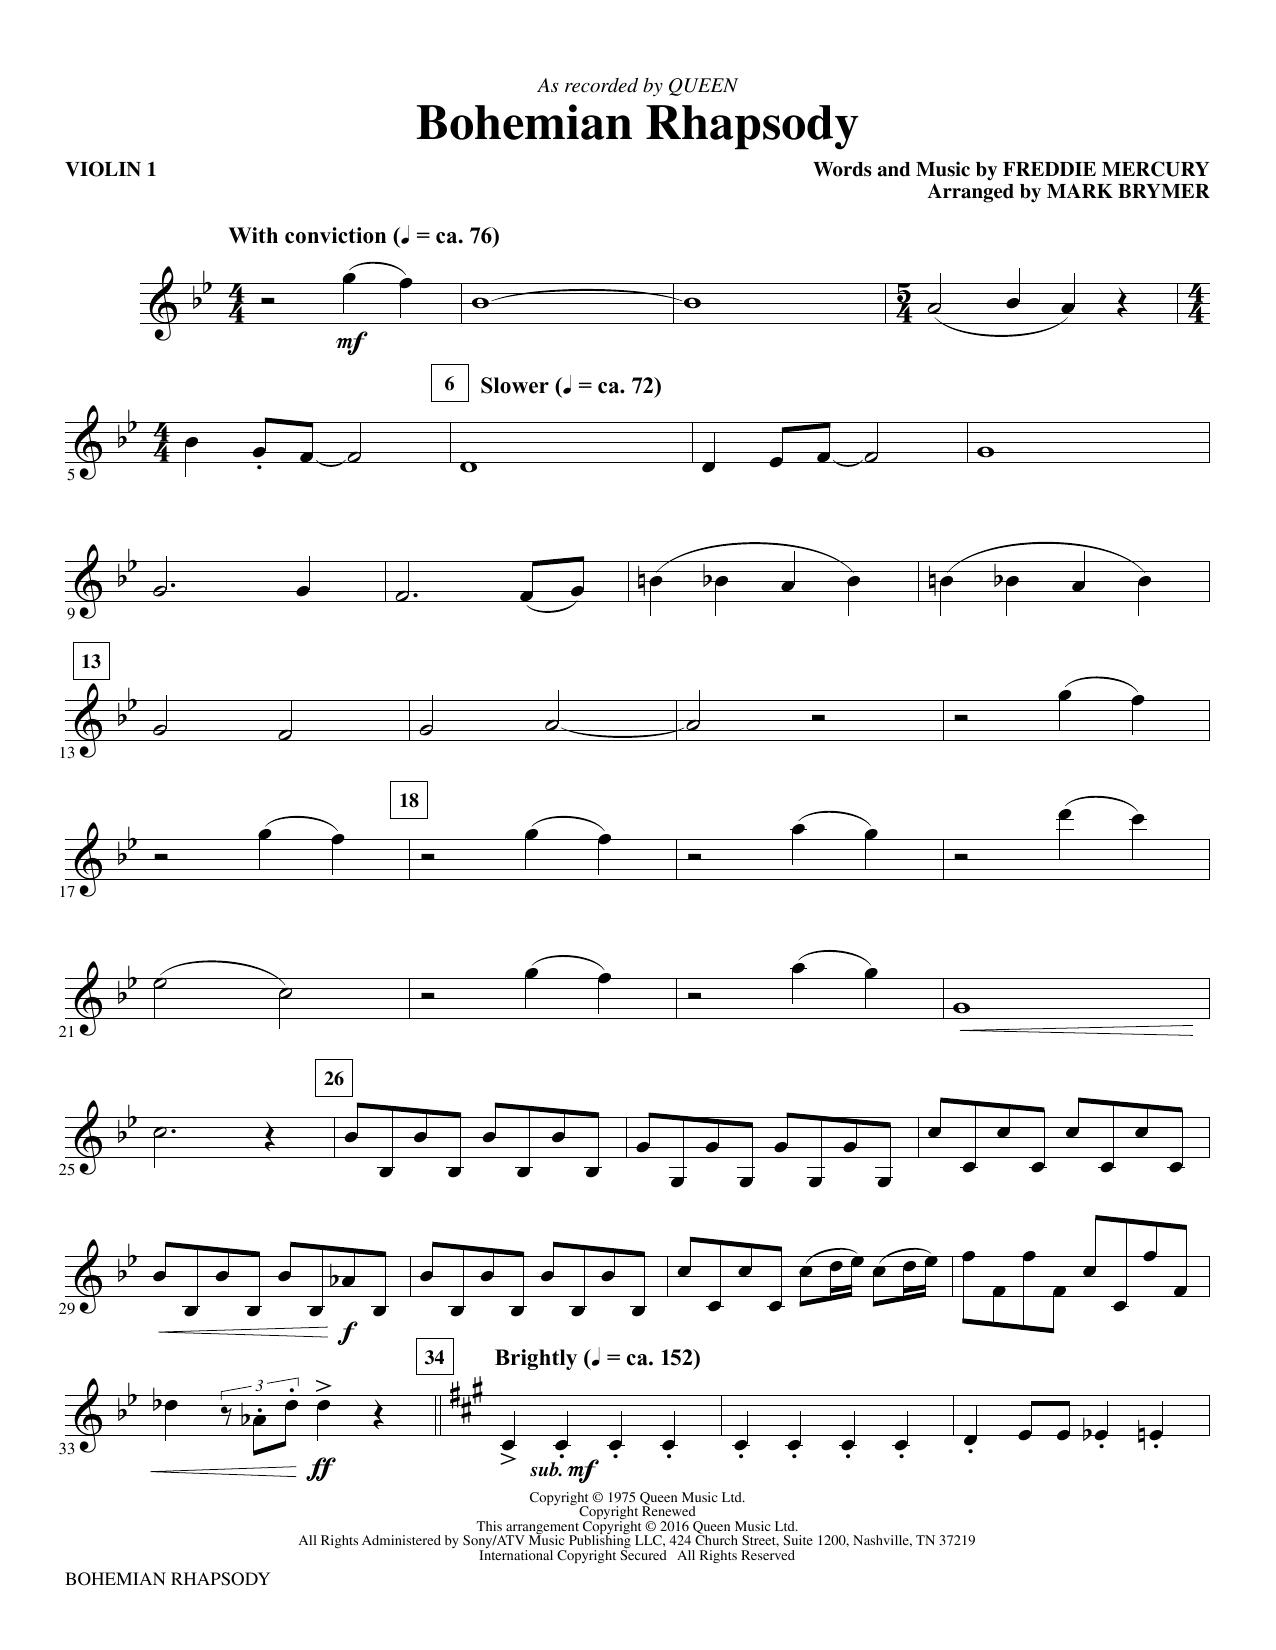 Queen 'Bohemian Rhapsody (arr  Mark Brymer) - Violin 1' Sheet Music Notes,  Chords | Download Printable Choral Instrumental Pak - SKU: 357180